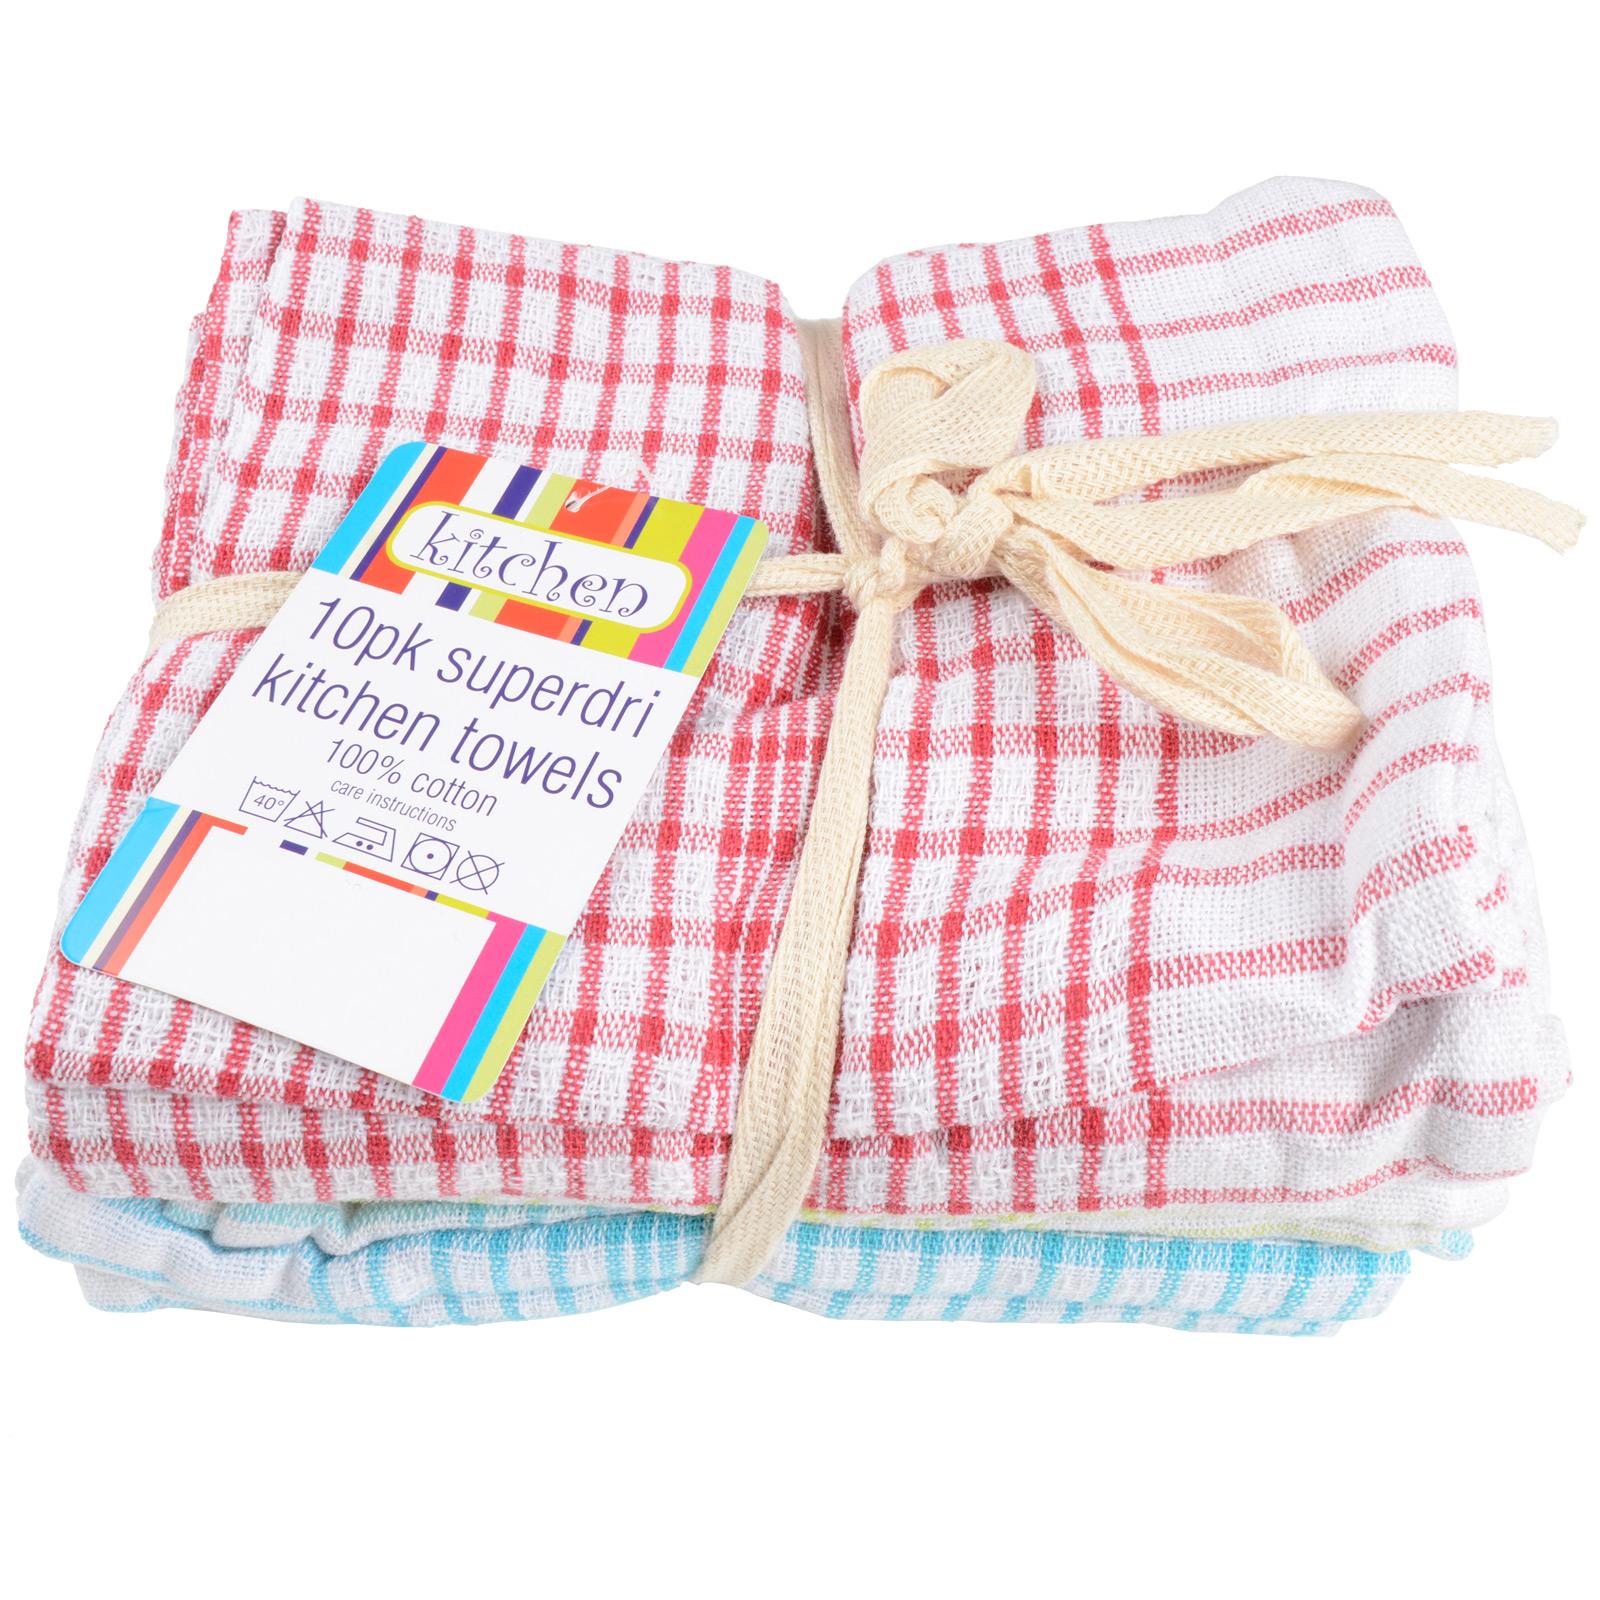 10 Pack Of 100 Cotton Superdri Kitchen Towels Dish Tea Towel Assorted Colours Ebay